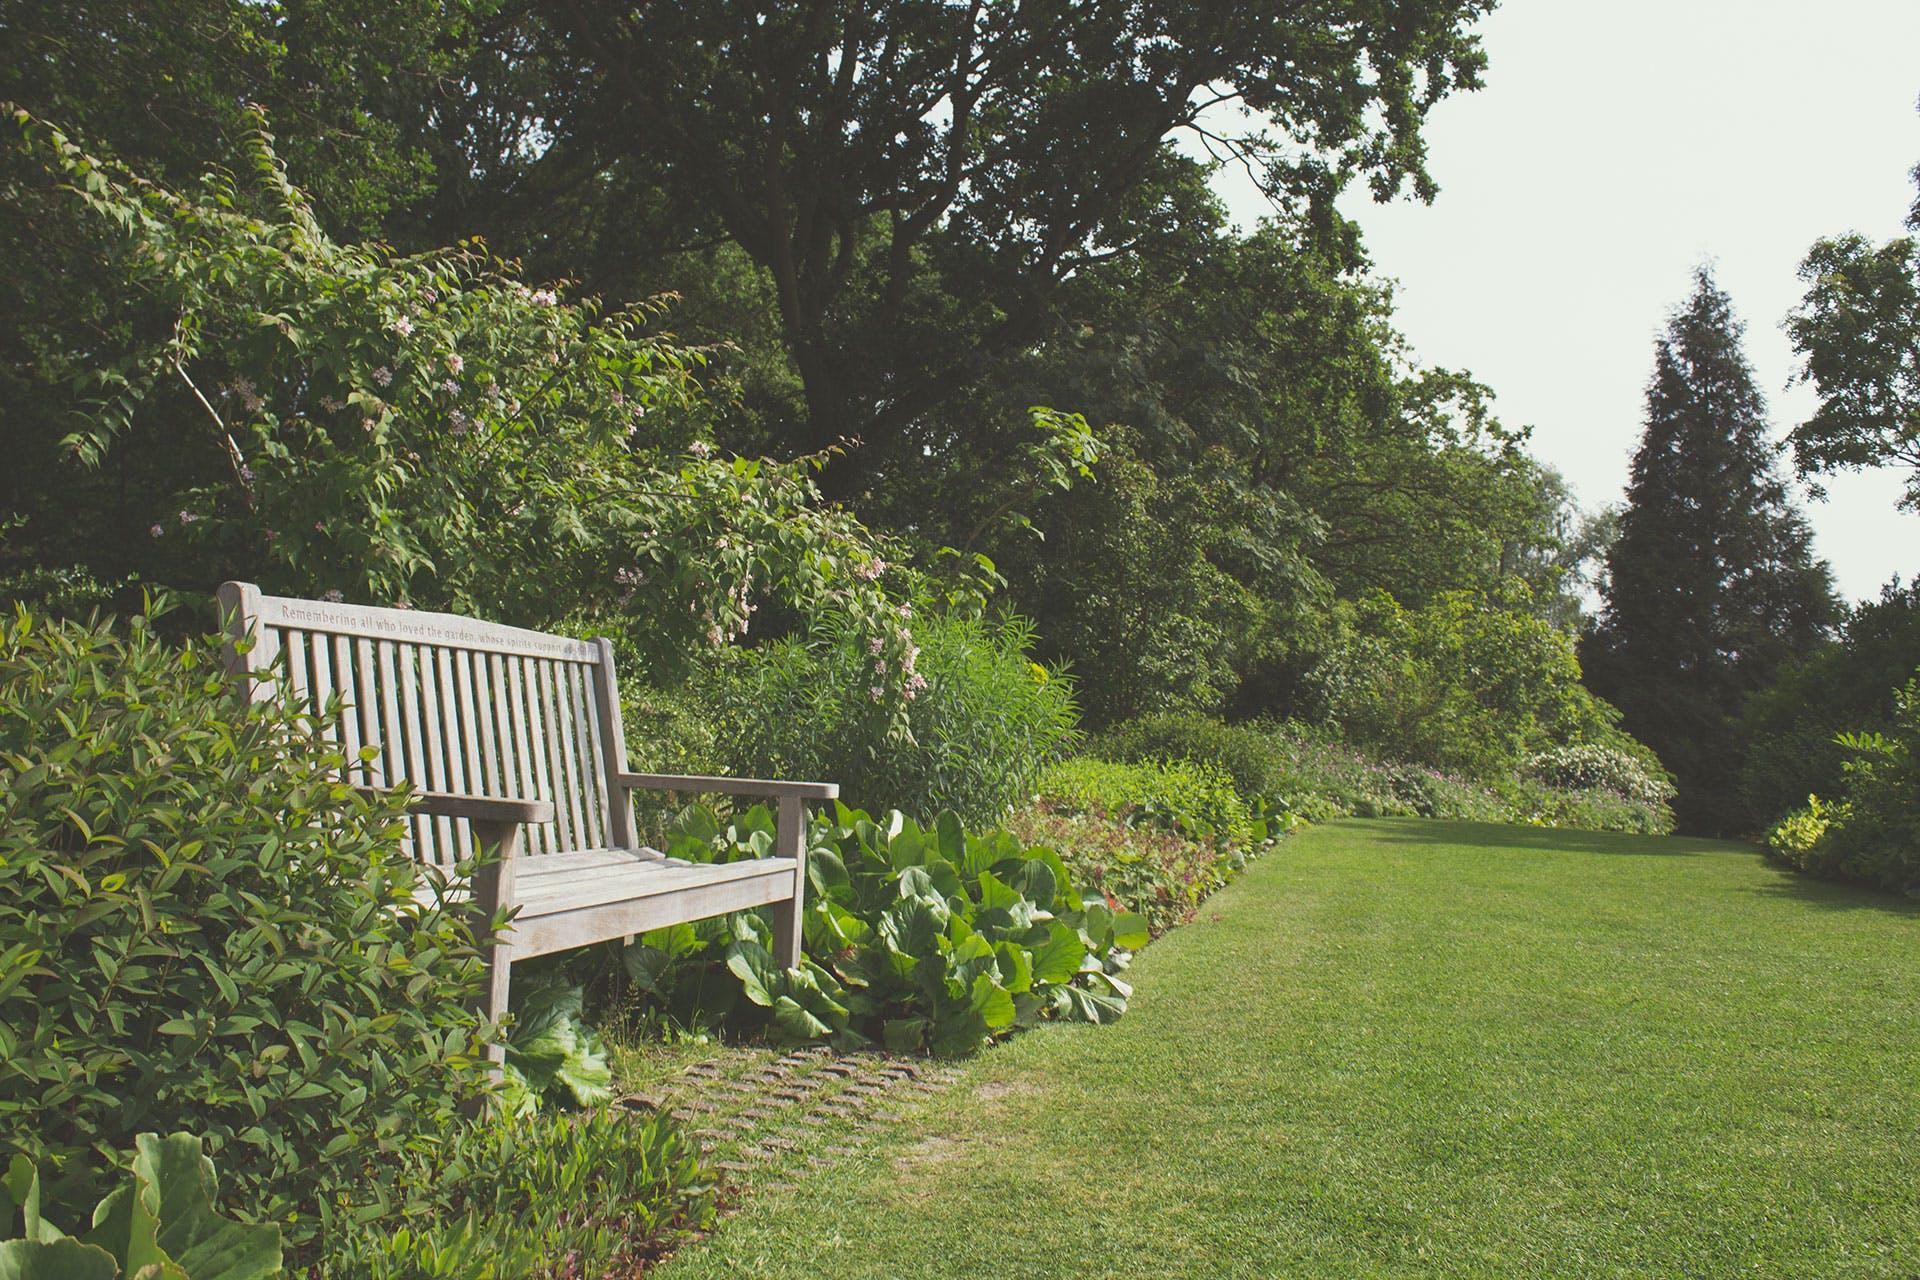 Foto profissional grátis de jardim